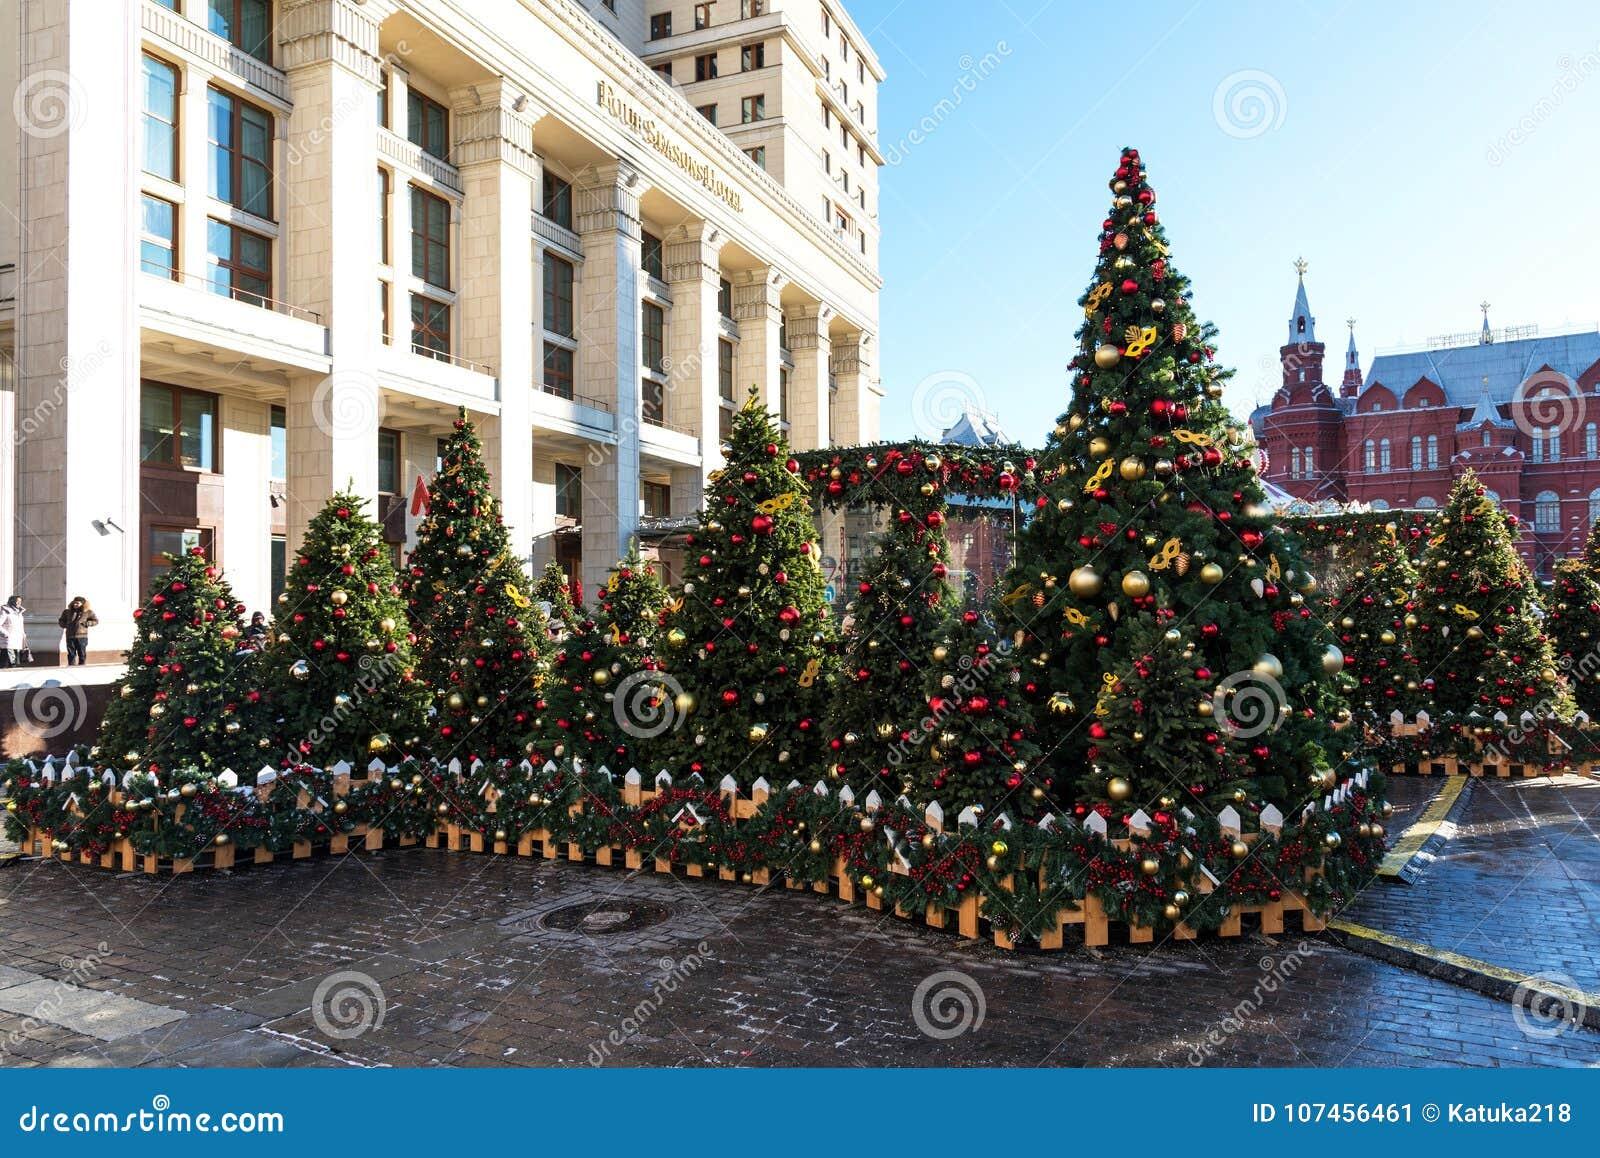 Festival Journey to Christmas 2018 99